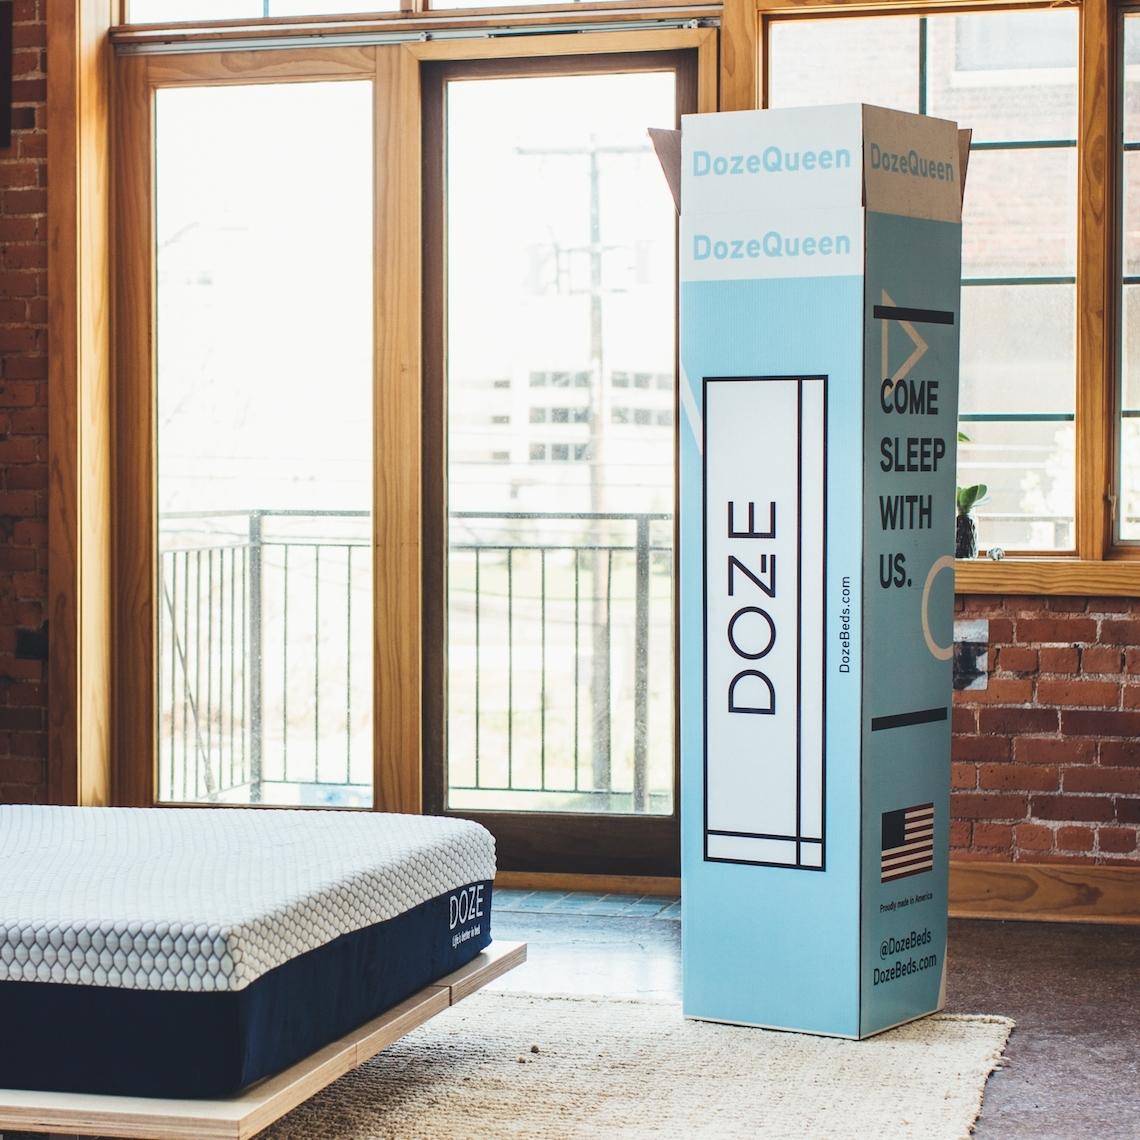 digital-printing-barberan-colorhub-corrugate-packaging